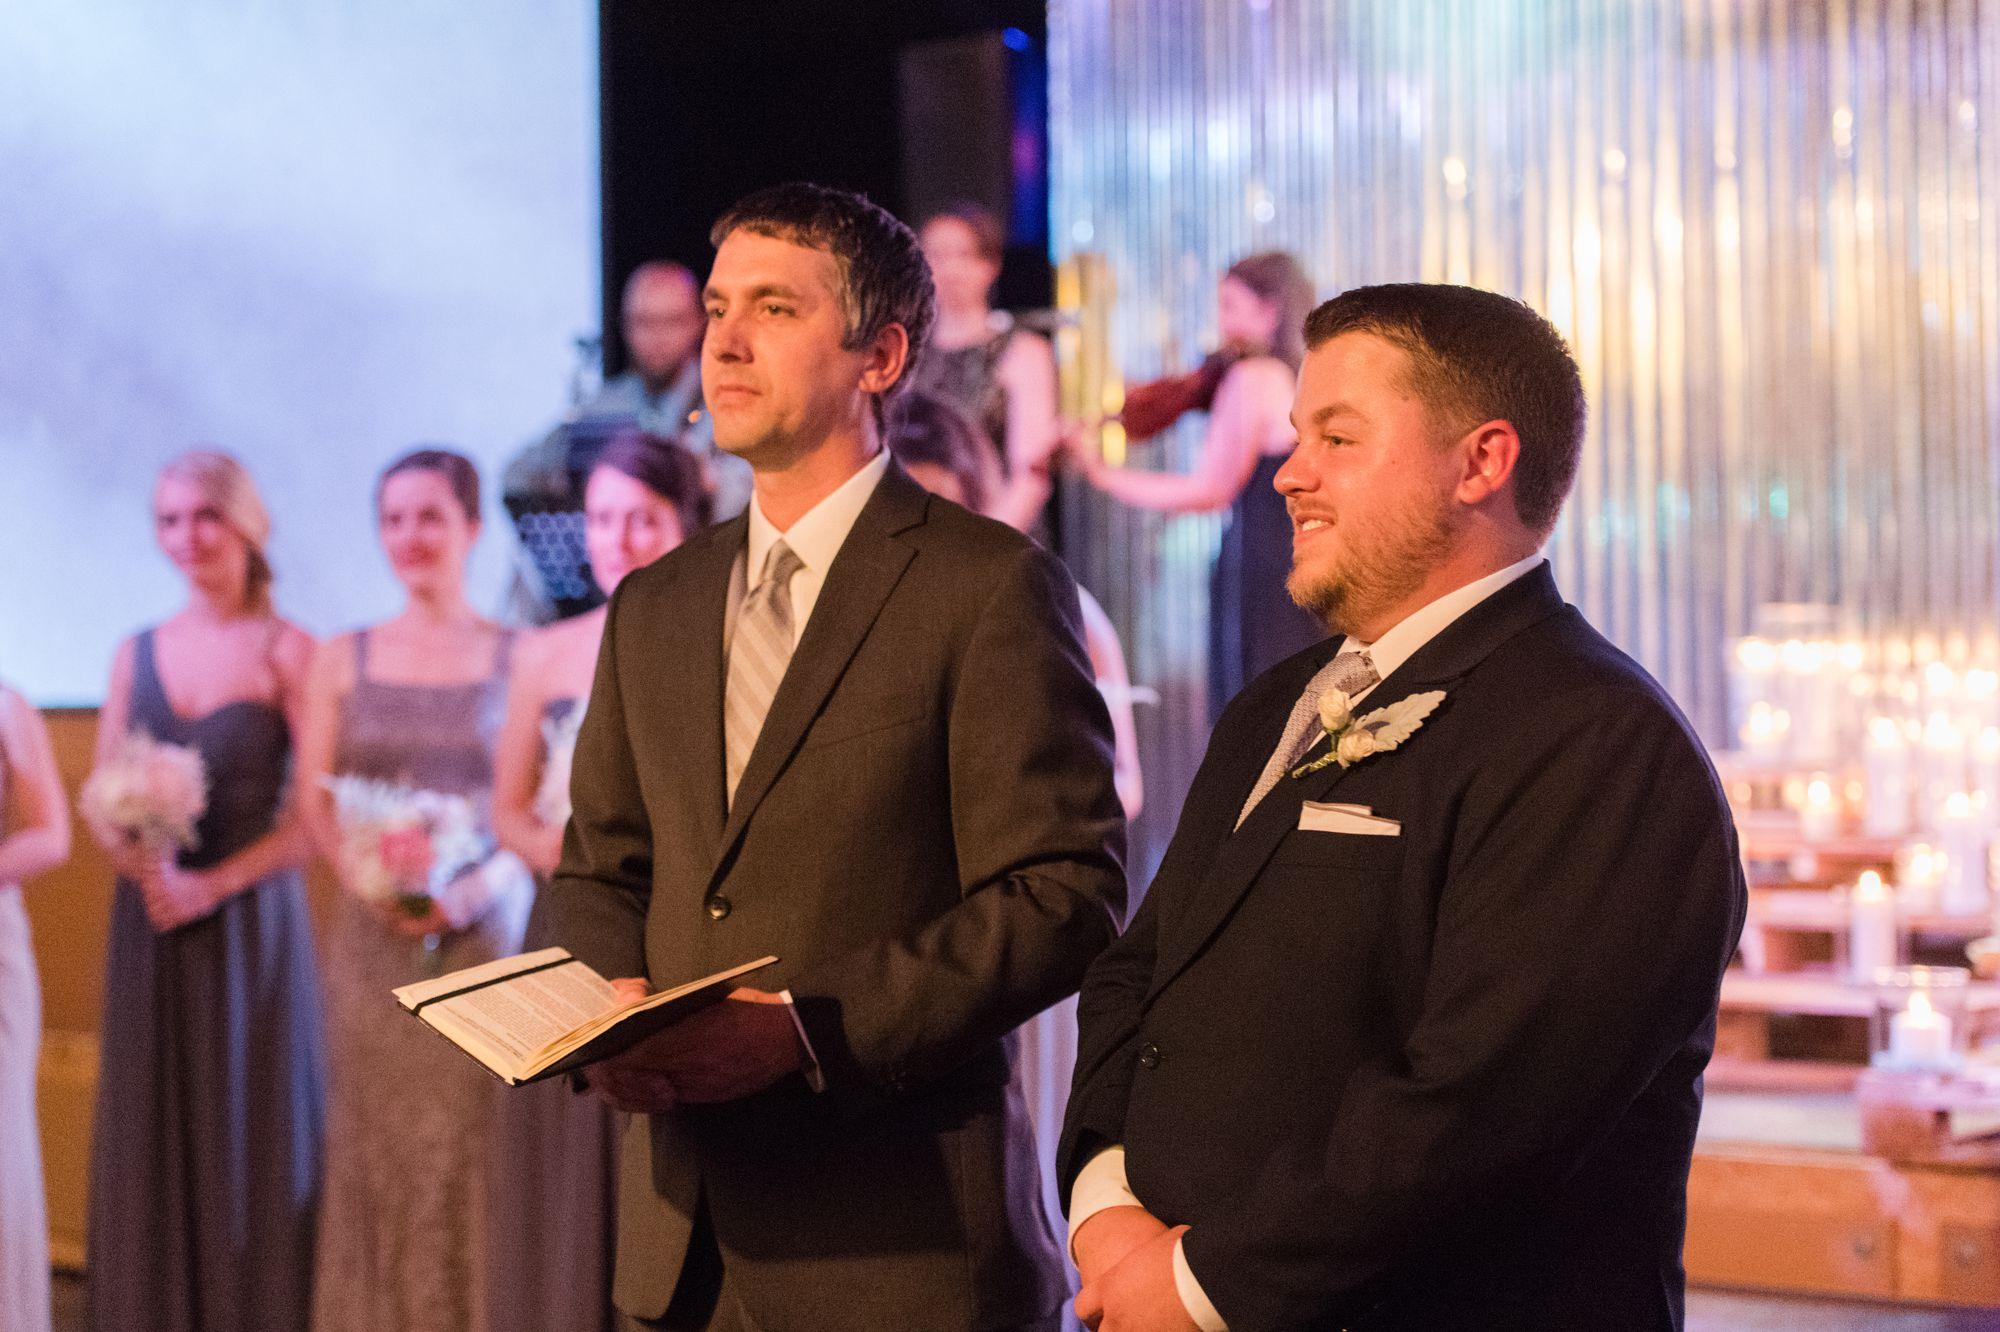 uptown-charlotte-warhouse-wedding 82